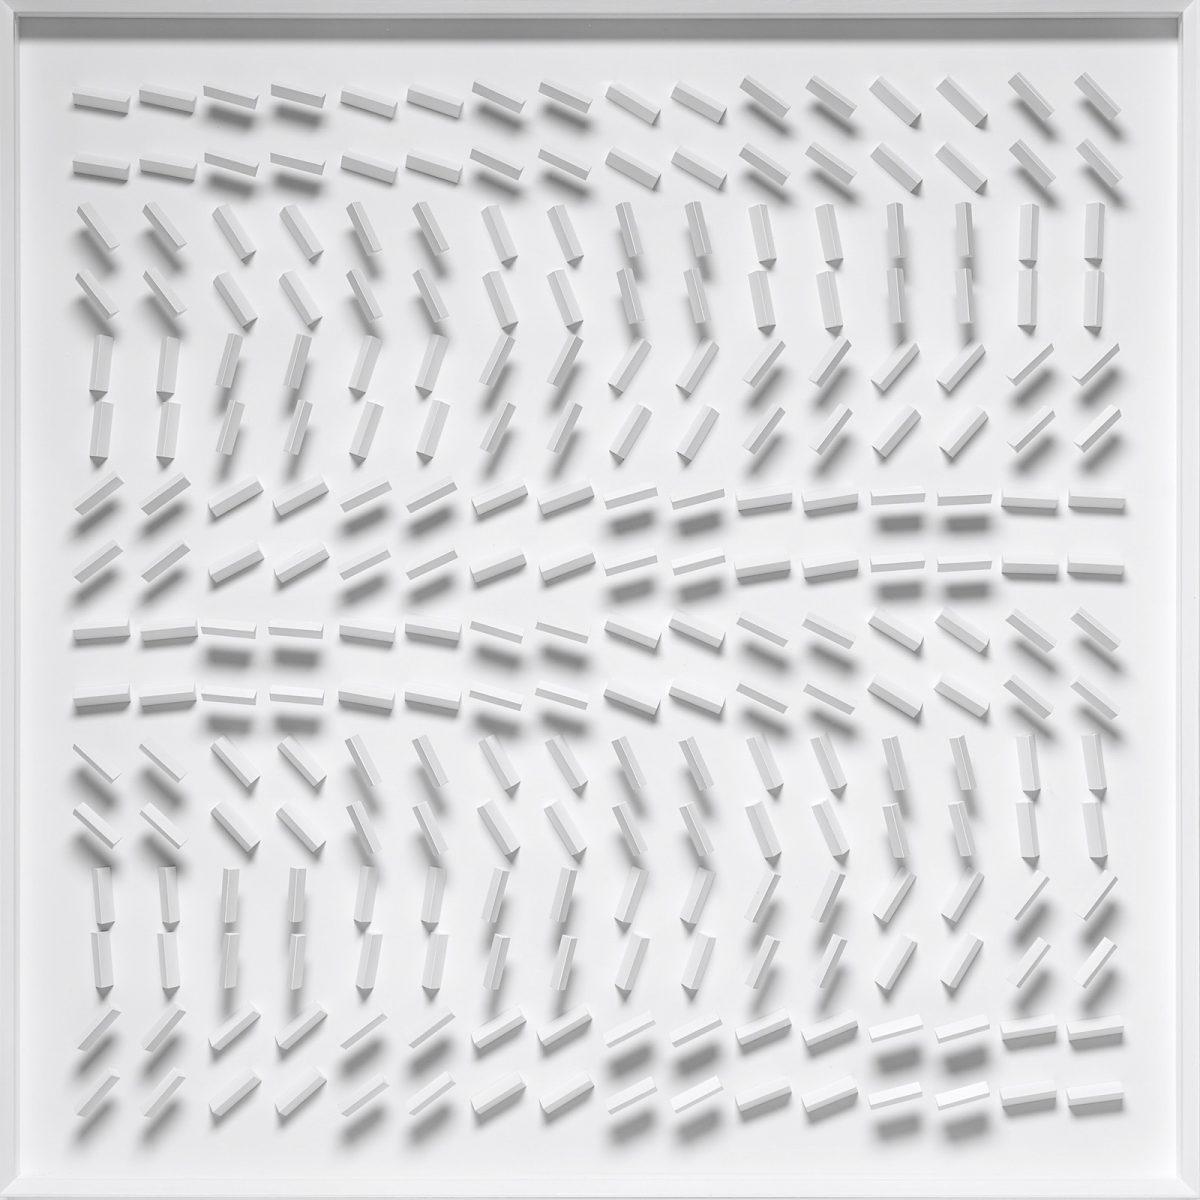 01 Klaus Staudt, Eco, 2019, 100 x 100 x 7,5cm; Foto: Norbert Miguletz